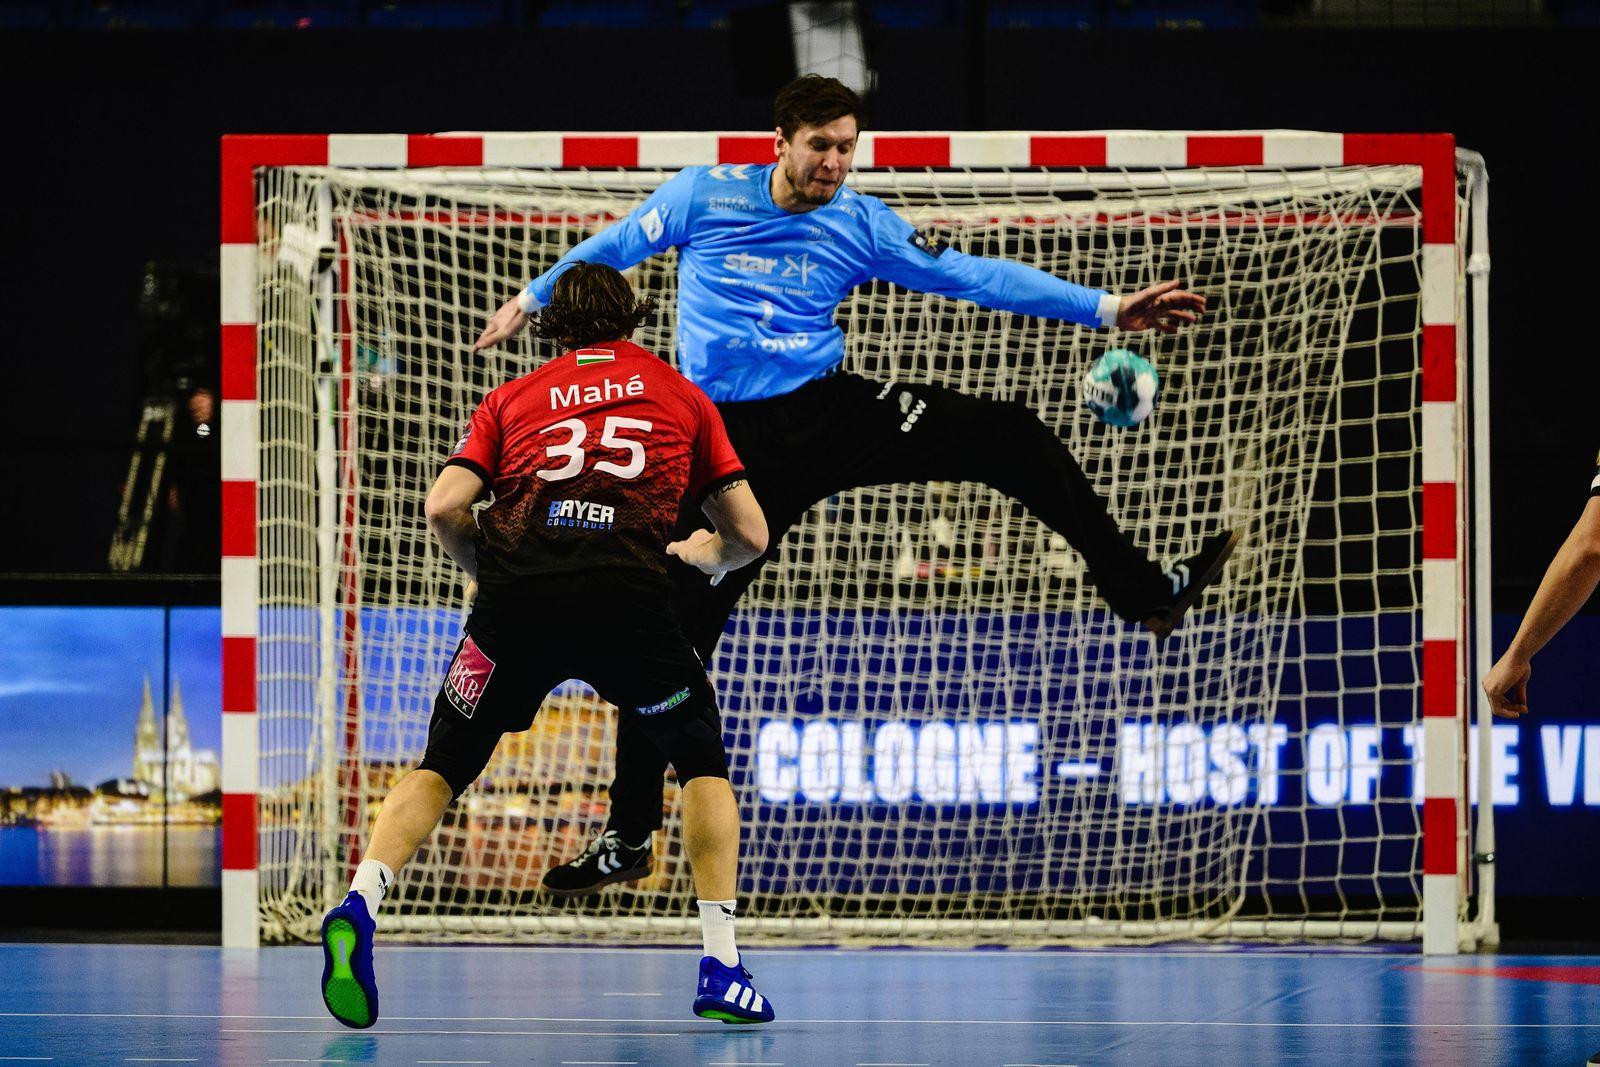 Handball EHF Final4 Halbfinale THW Kiel - Telekom Veszprem am 28.12.2020 in der Lanxess Arena in Köln Kentin Mahe ( Ves